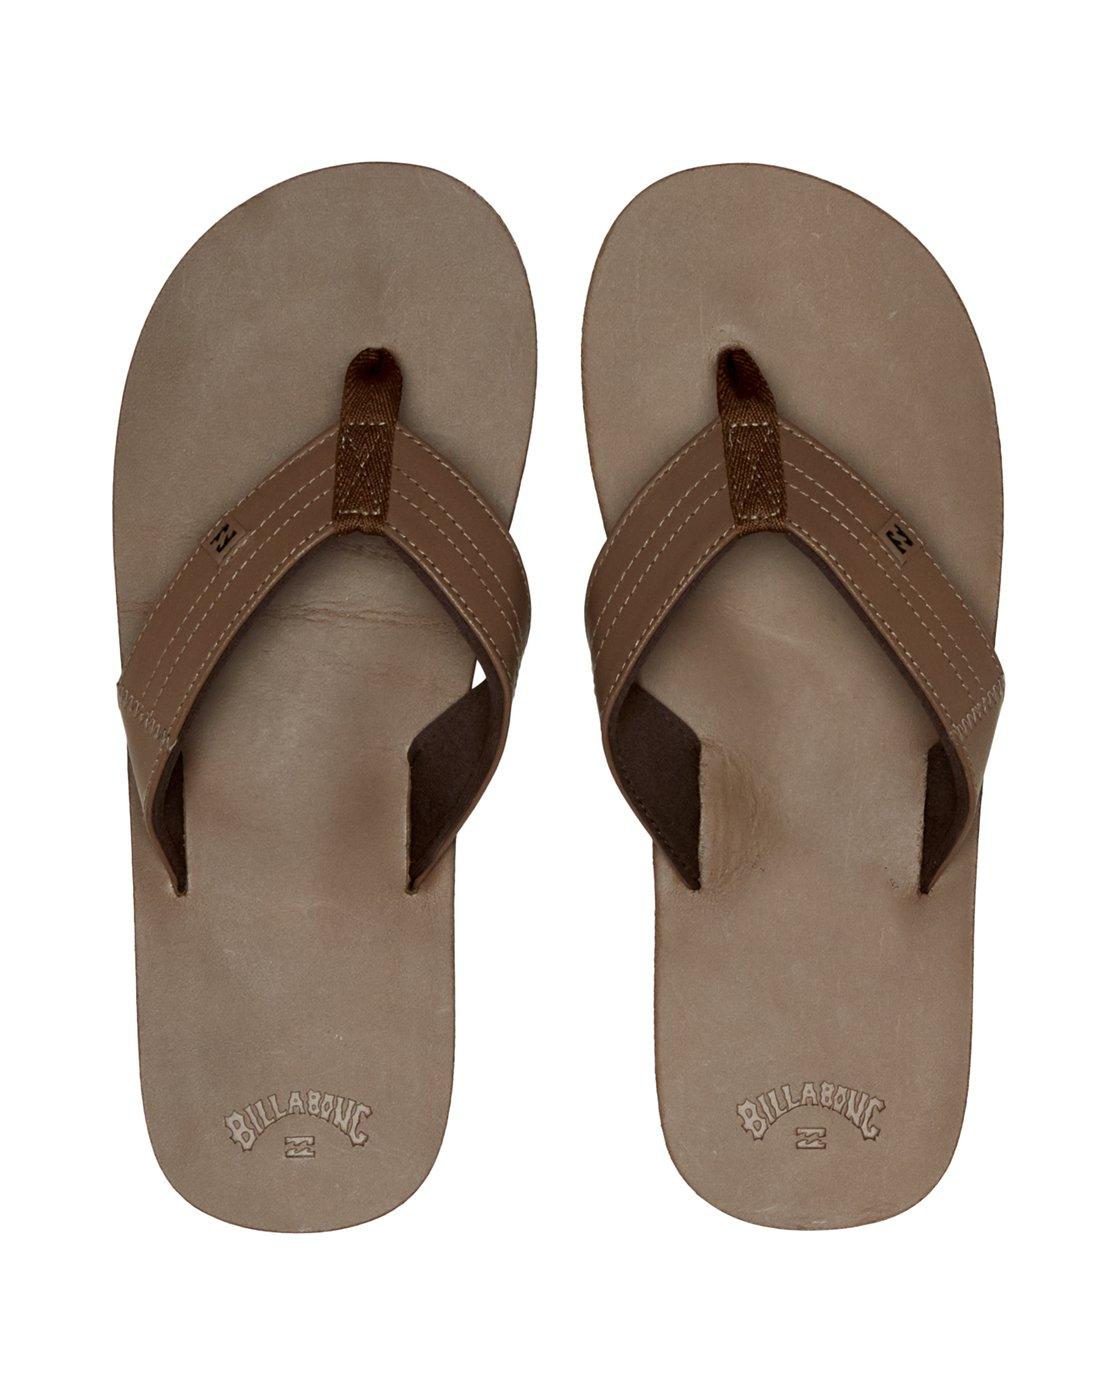 Seaway Leather - Flip-Flops for Men